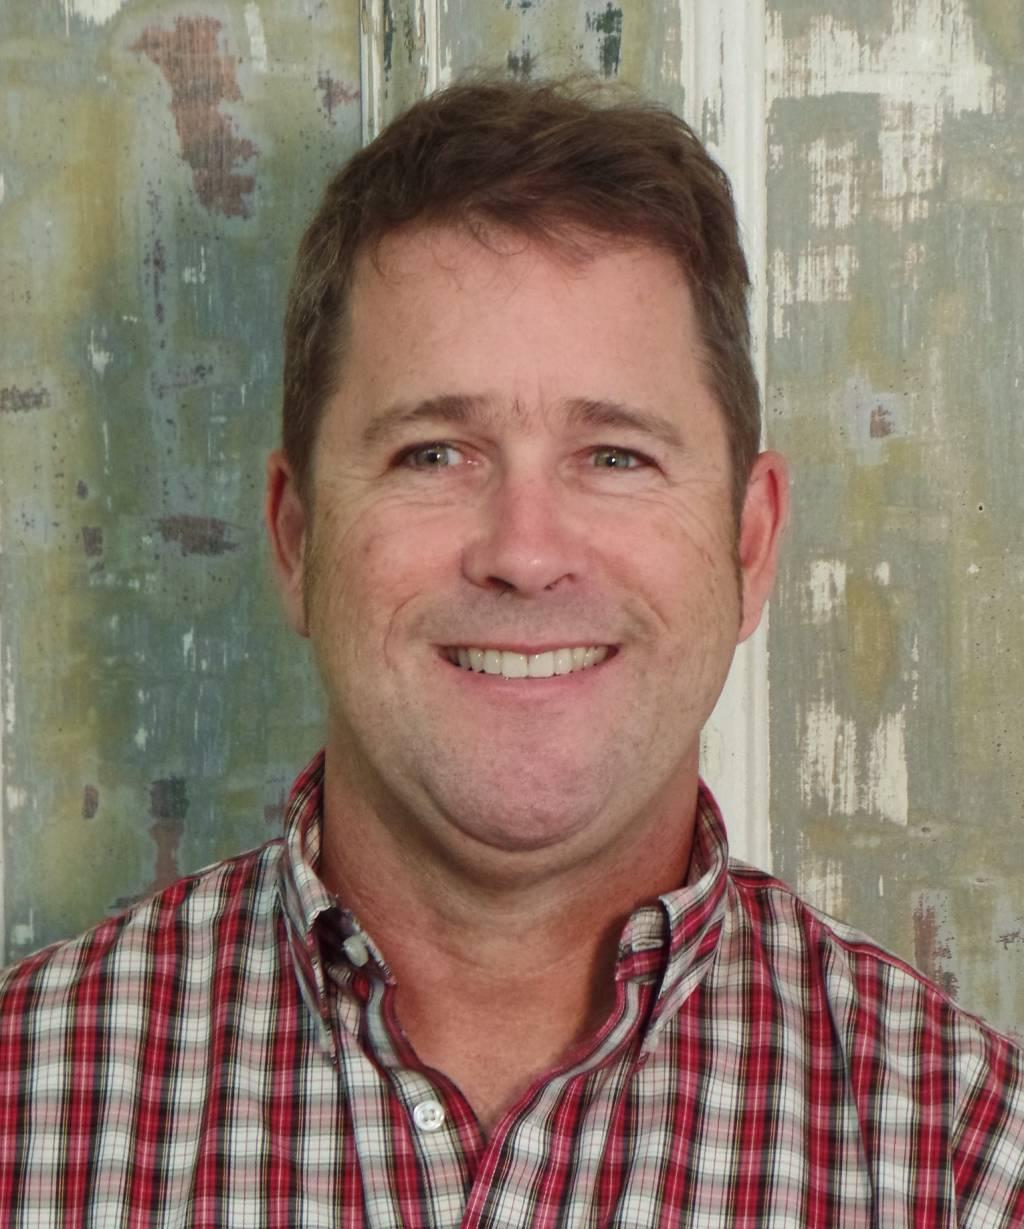 Kevin Gilleran